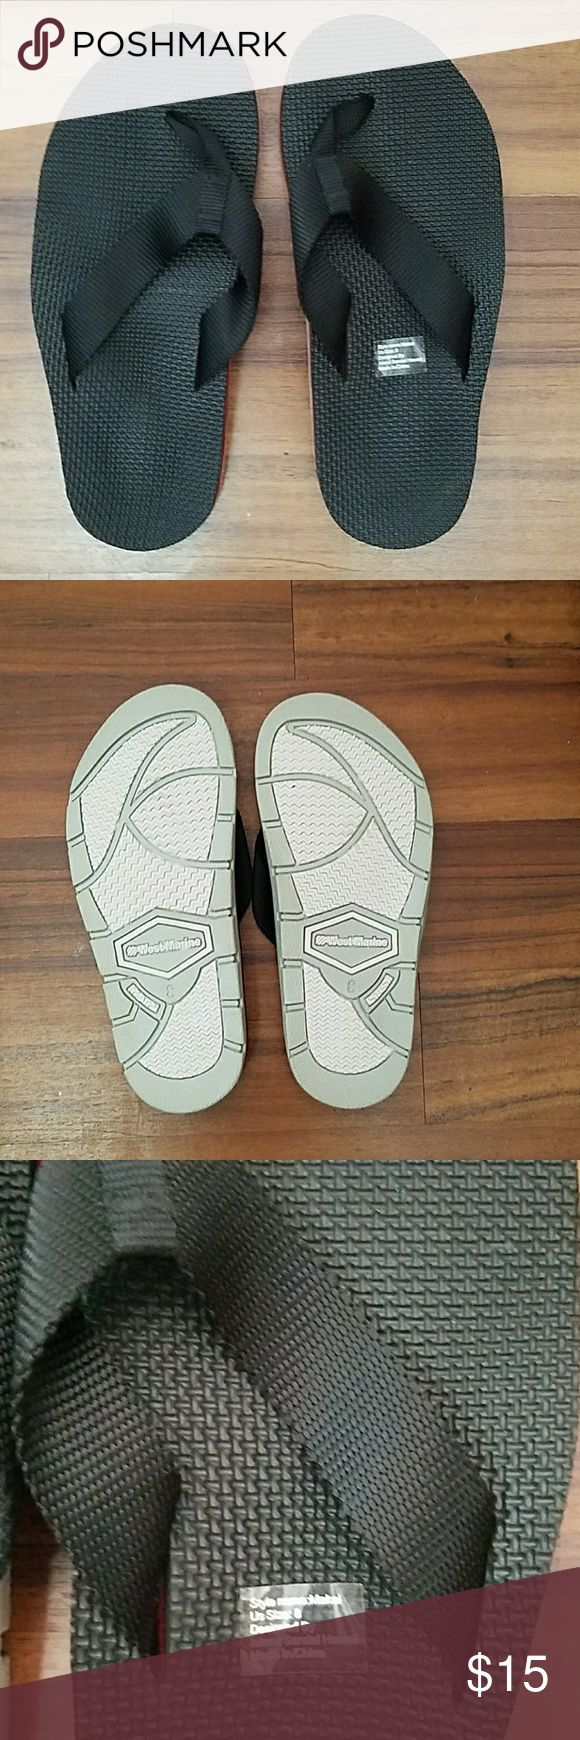 Brand new West Marine Slipper/Flip  Flop Brand new black West Marine slippers. Grip on the bottom of the flip flops. West Marine Shoes Sandals & Flip-Flops